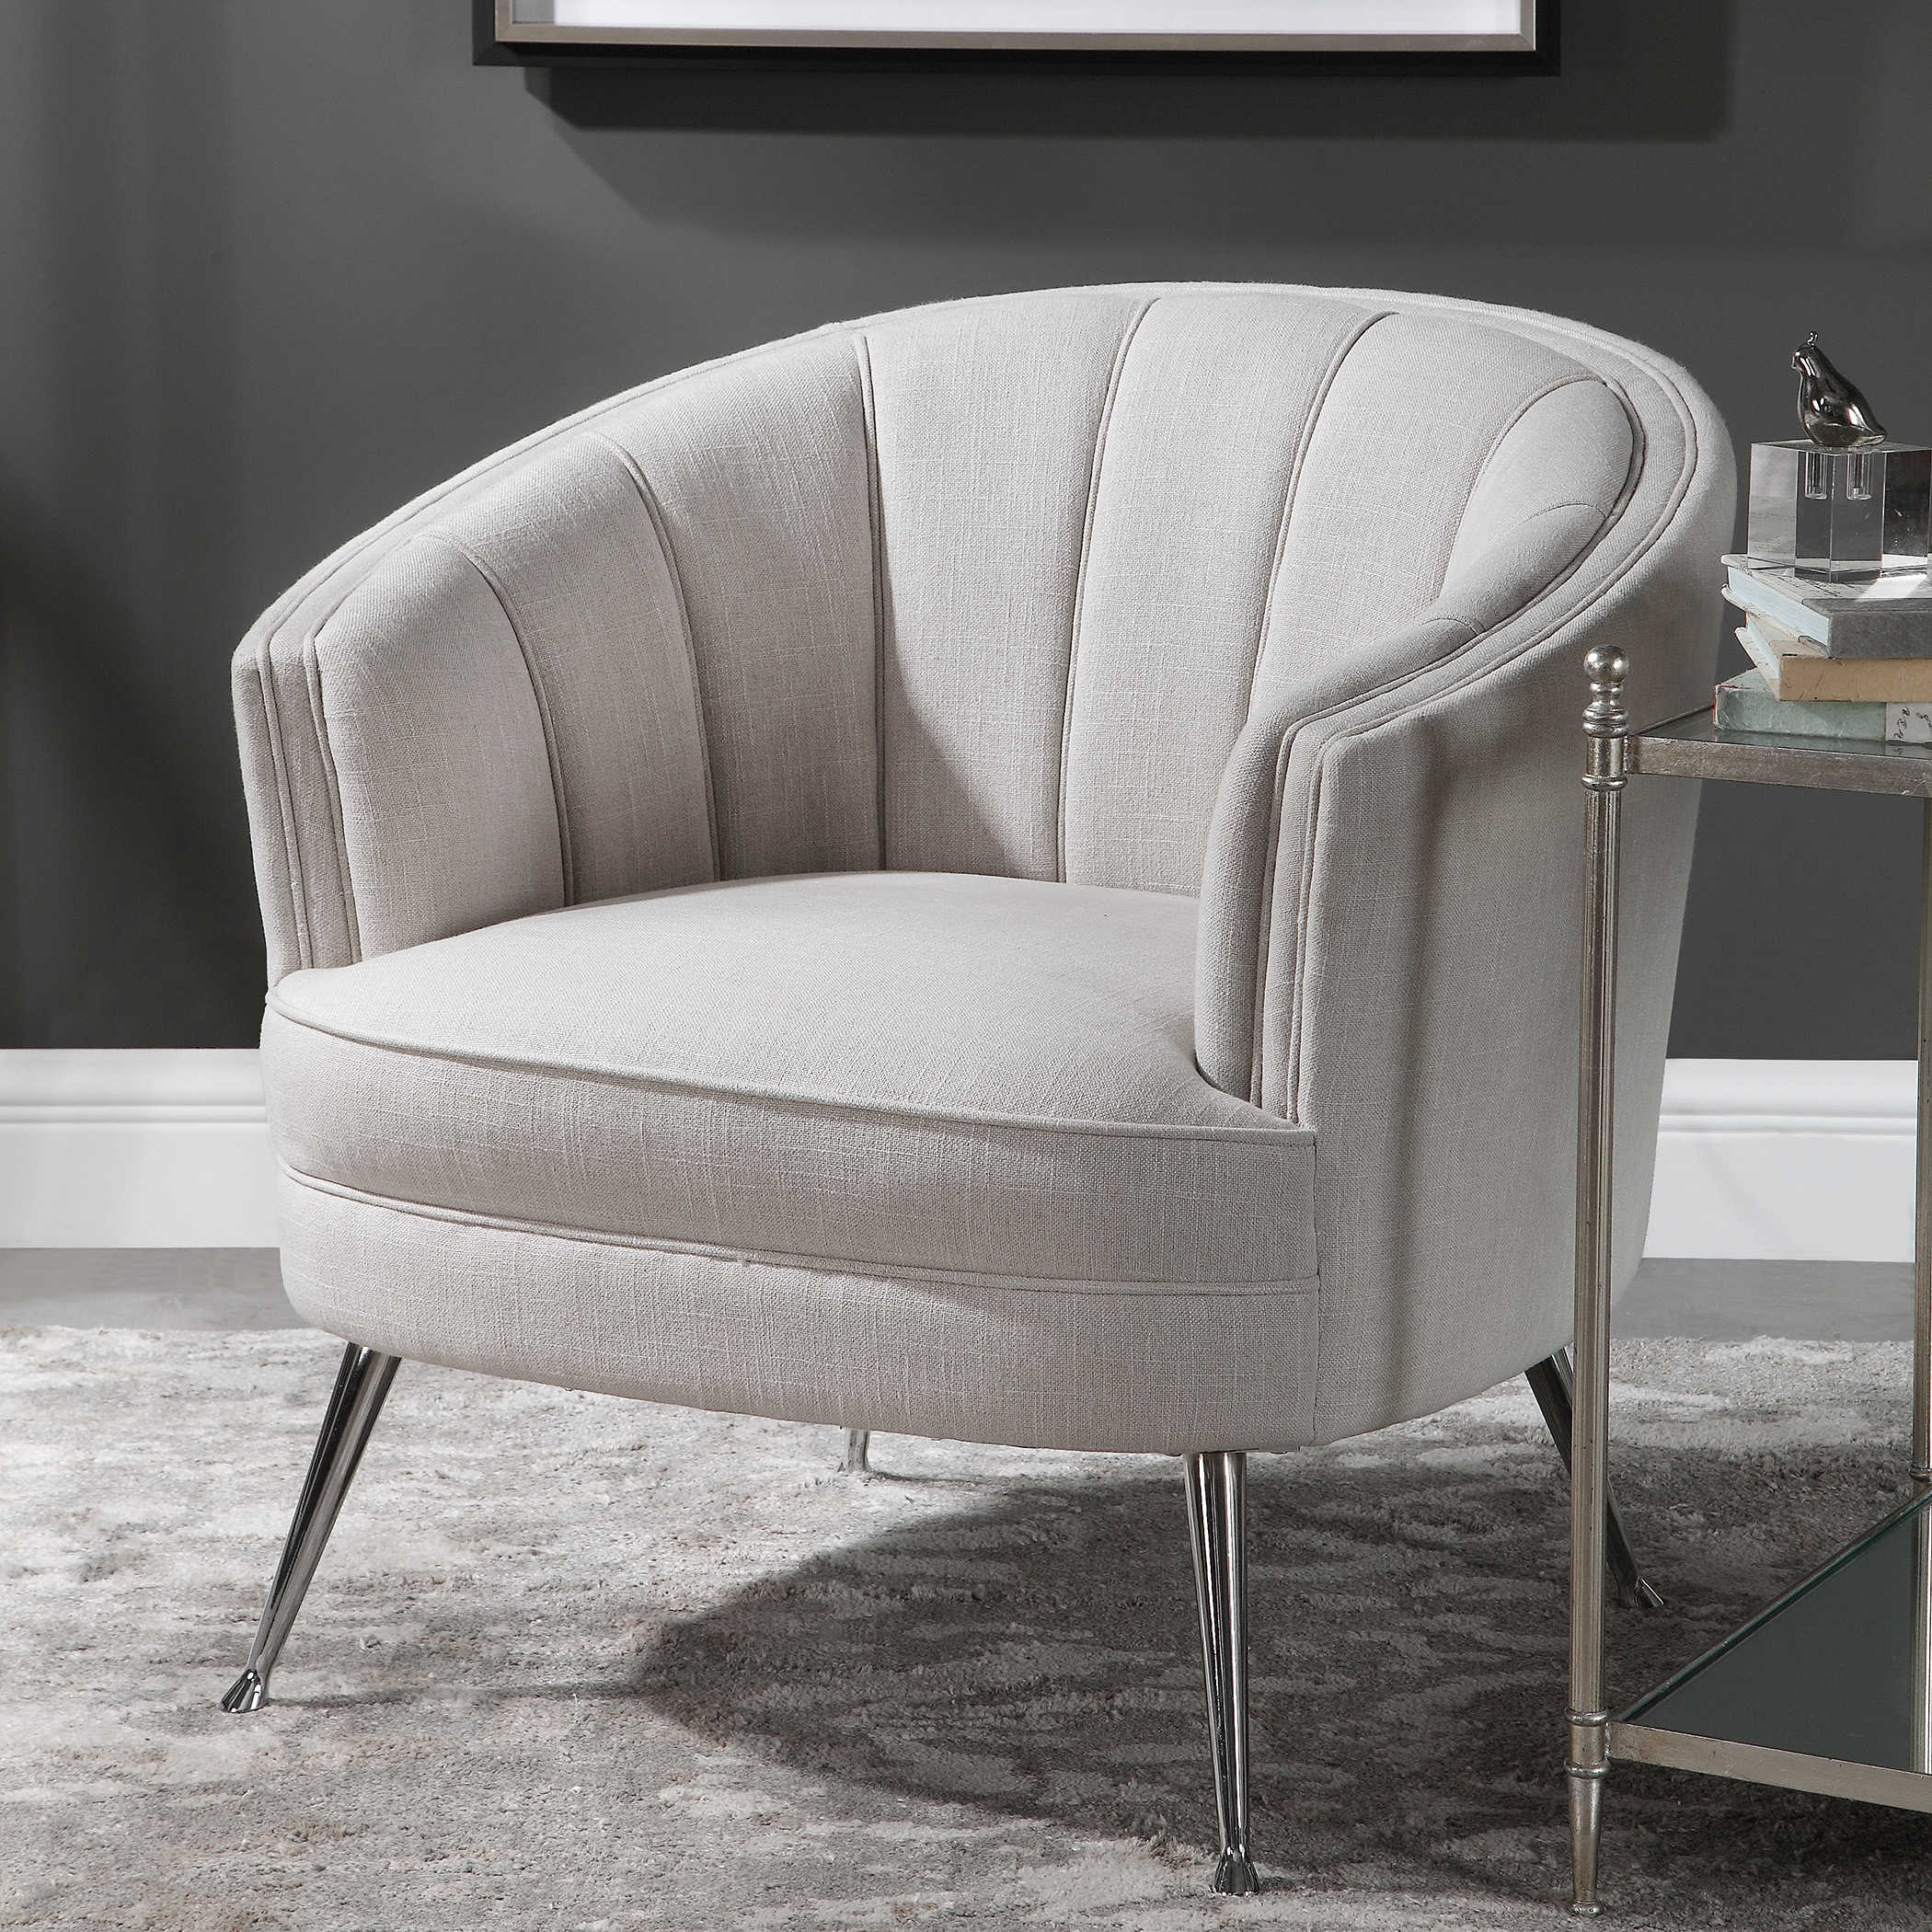 Super Janie Accent Chair Bralicious Painted Fabric Chair Ideas Braliciousco